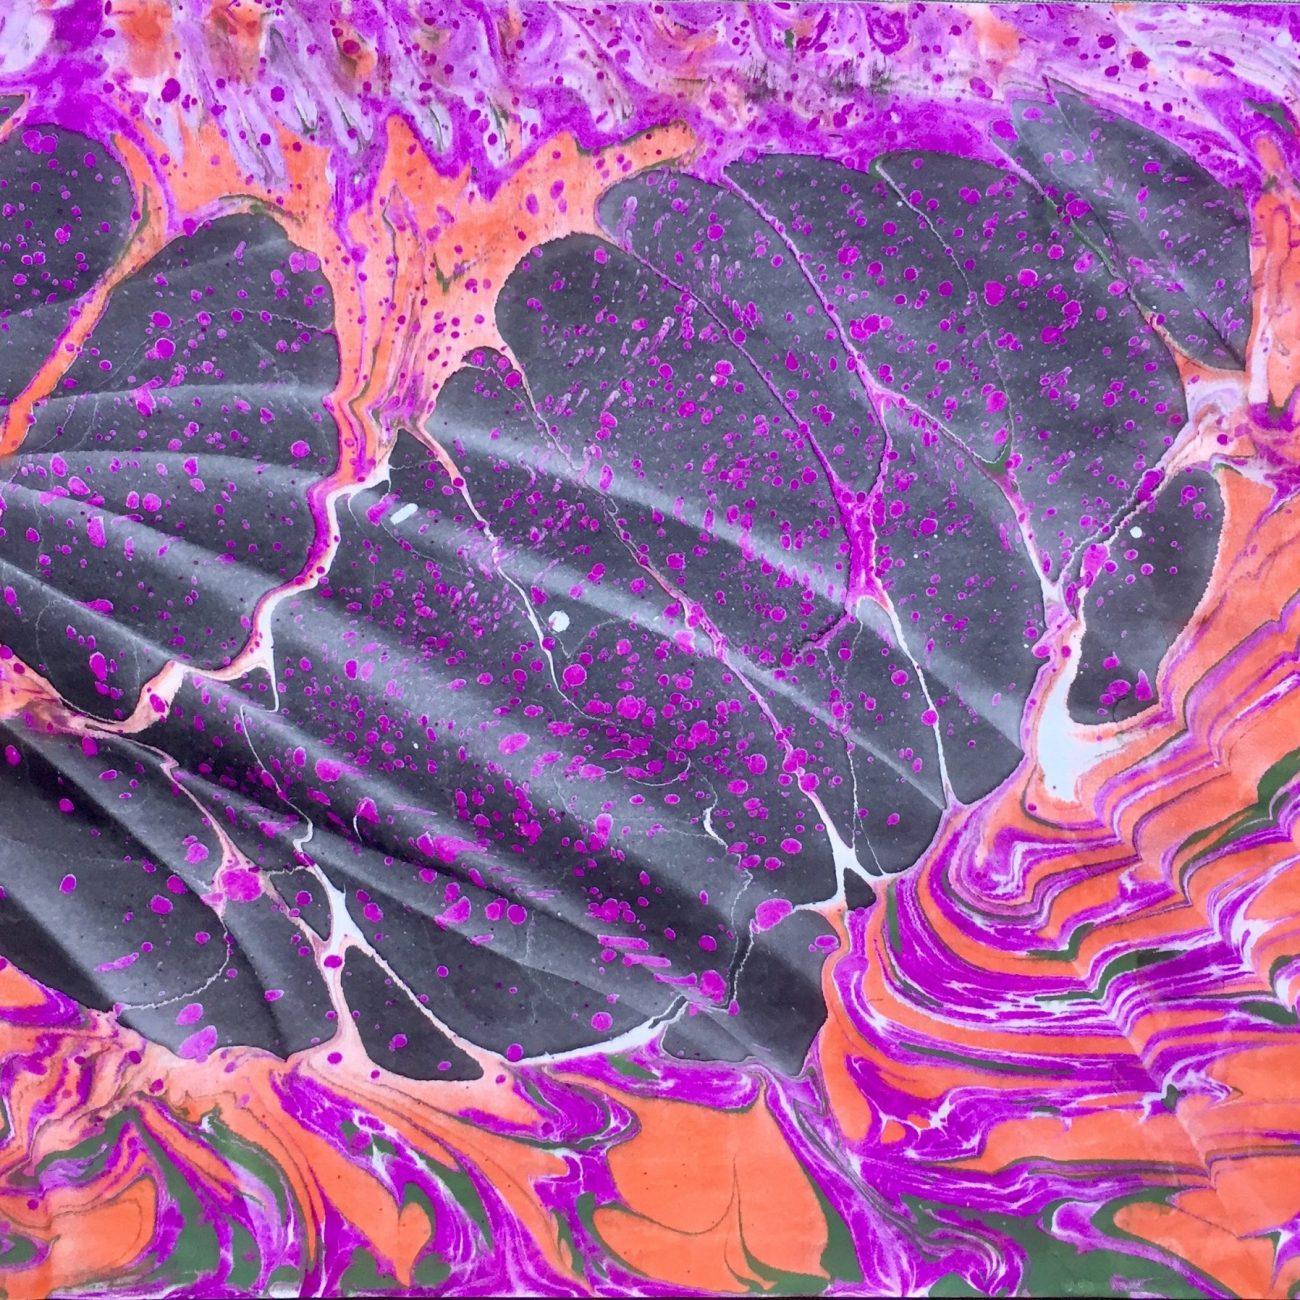 Butterfly-Teknik: Ebru Tekniği Ölçü: 35 x 50 cm  Fiyat : 1.500 TL